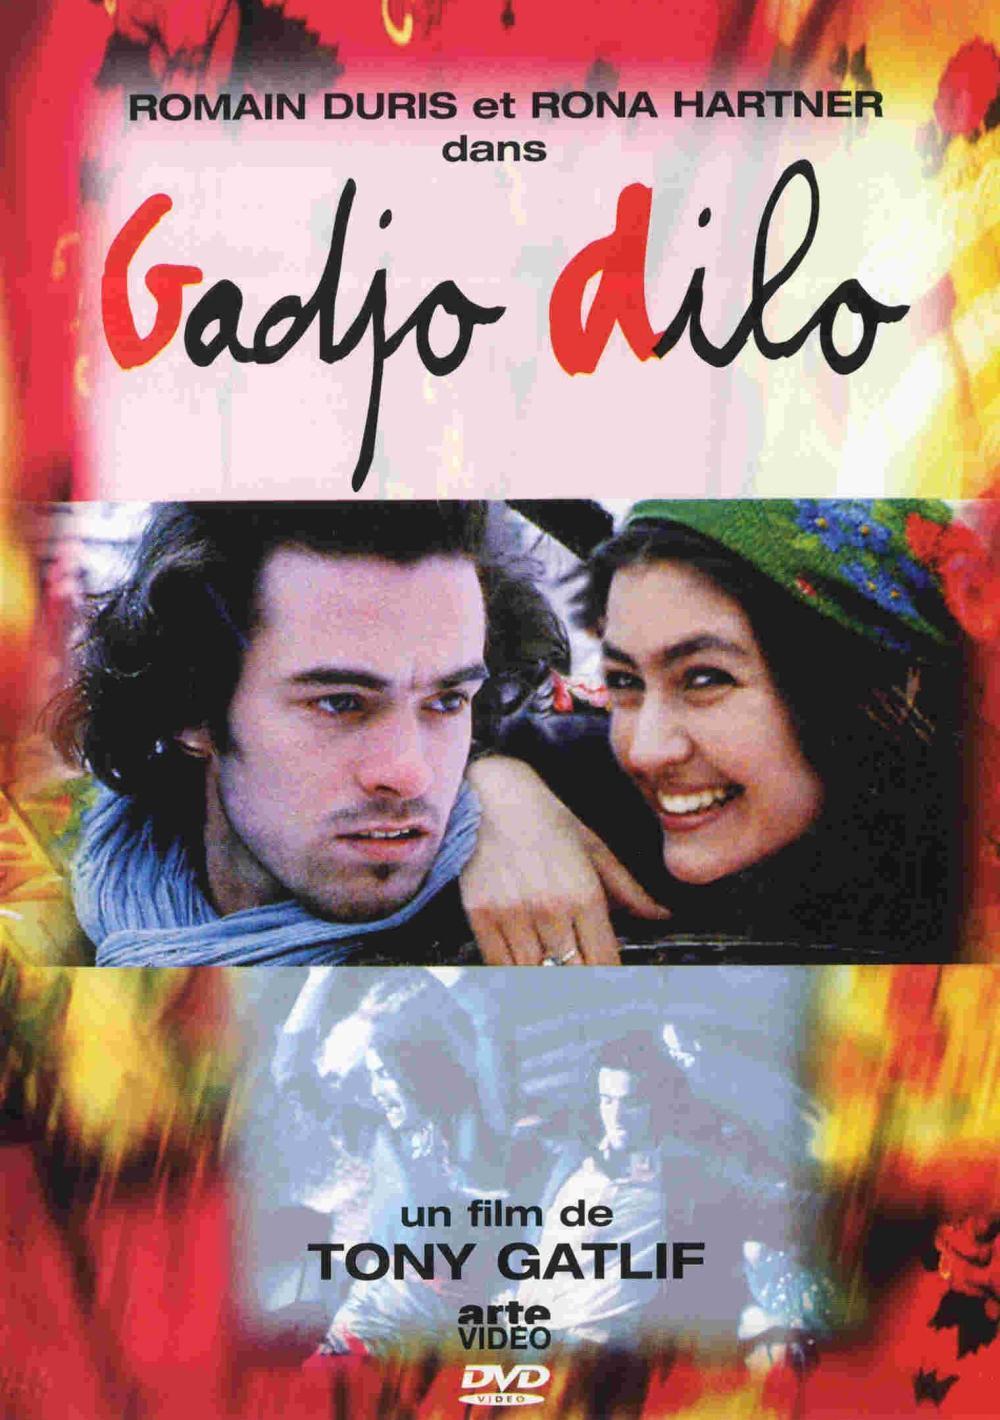 Gadjo-Dilo.jpg